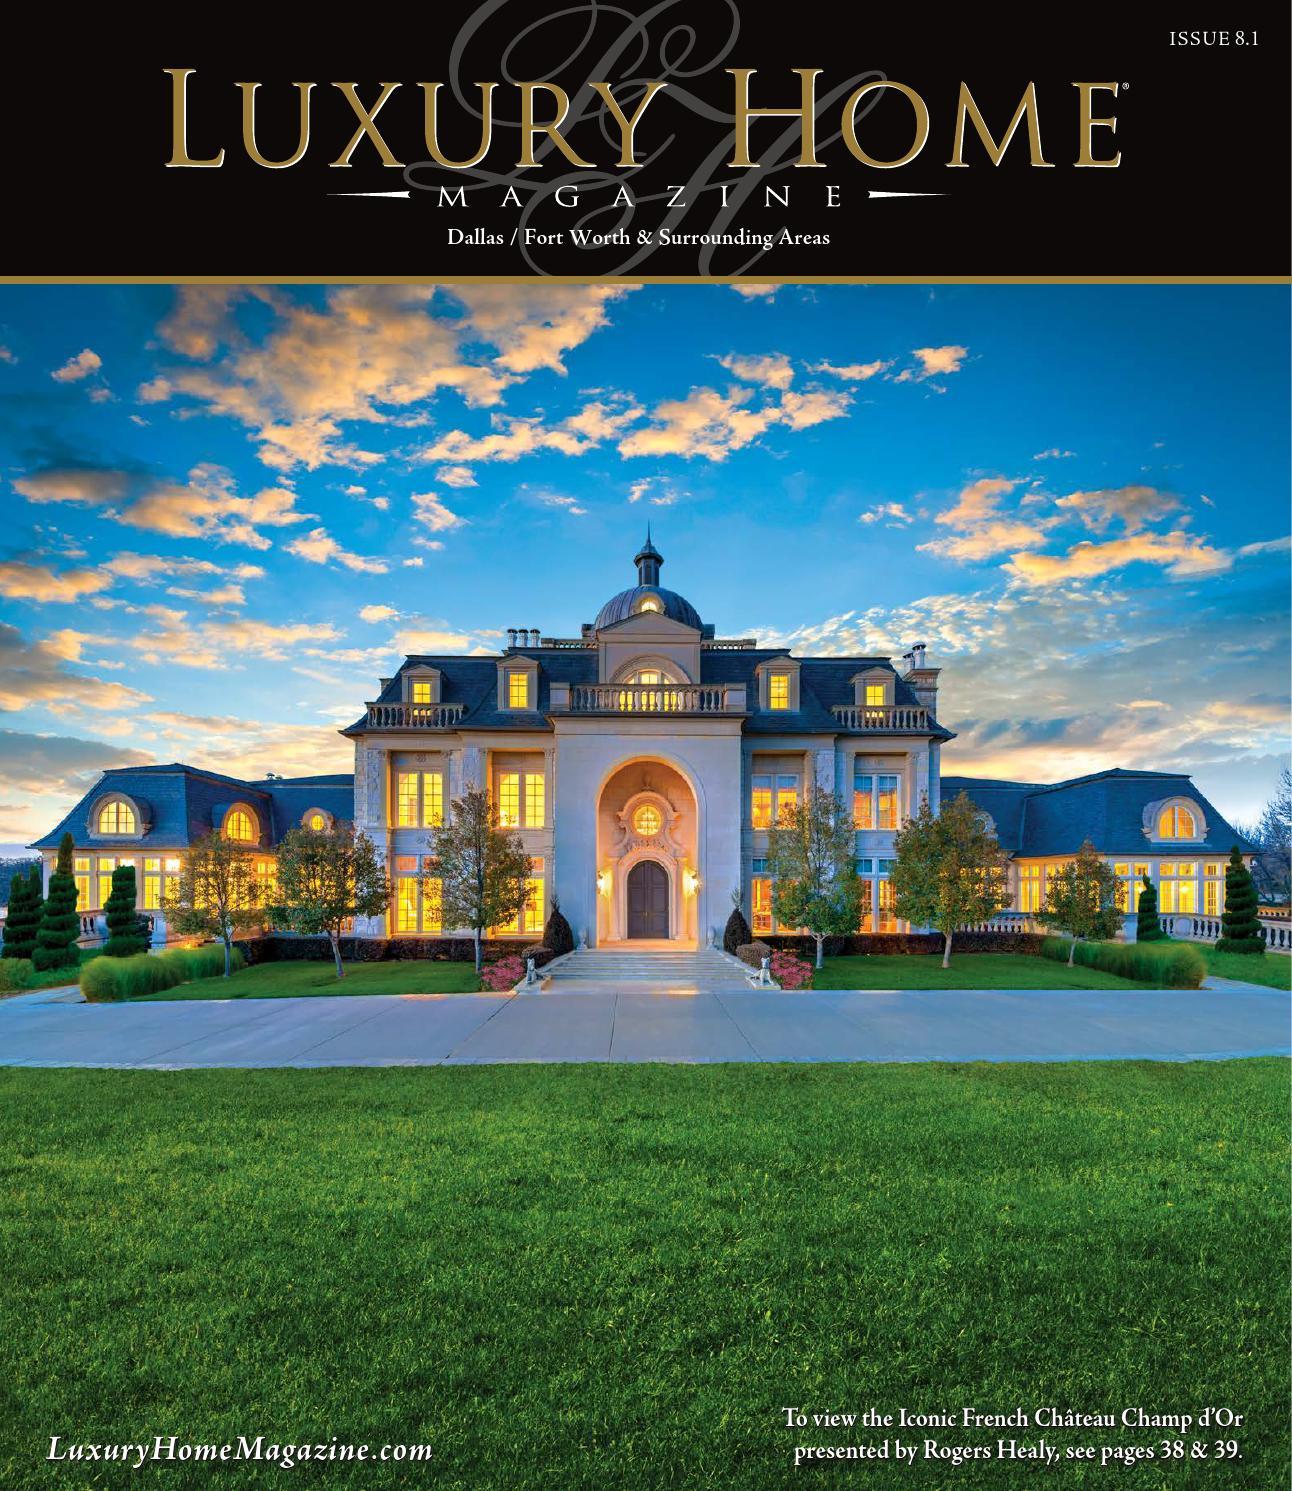 Luxury Home Magazine Dallas | Ft. Worth